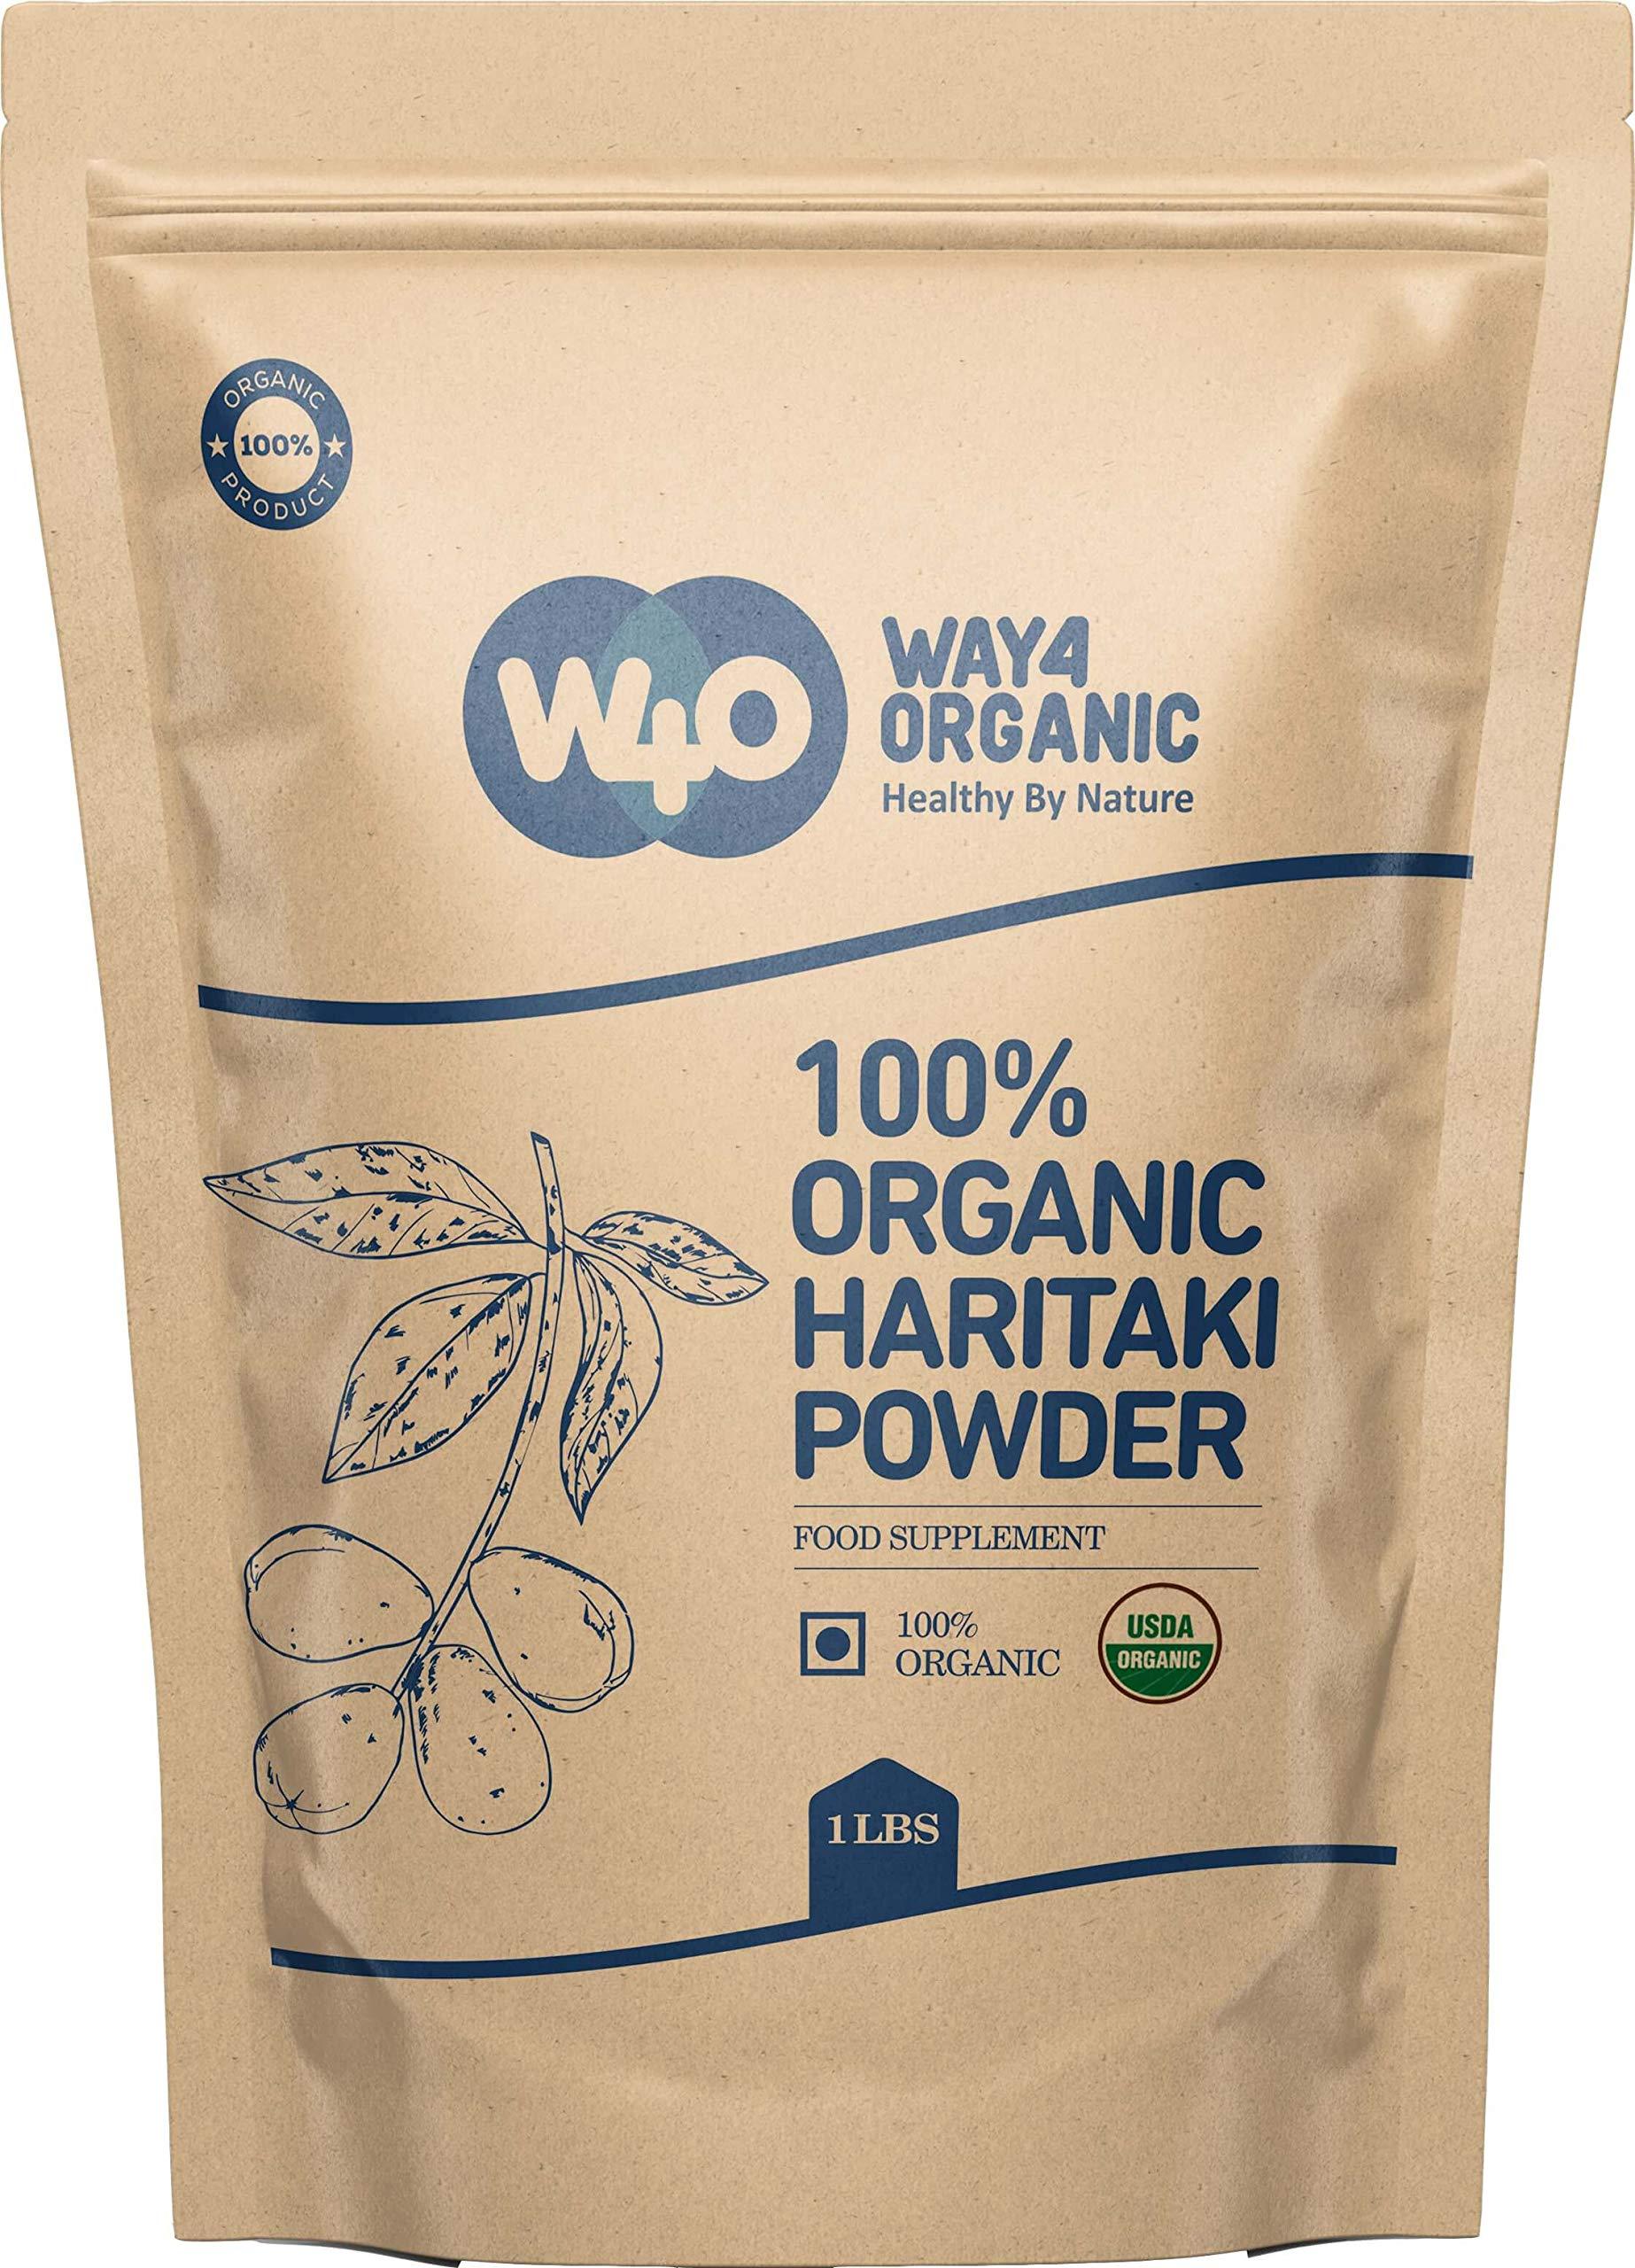 Organic Haritaki Powder 1lb (16 Ounces), Terminalia Chebula (Kadukkai) - Detoxification & Rejuvenation*, Good for Hair & to Reduce Dark Circles - Way4Organic